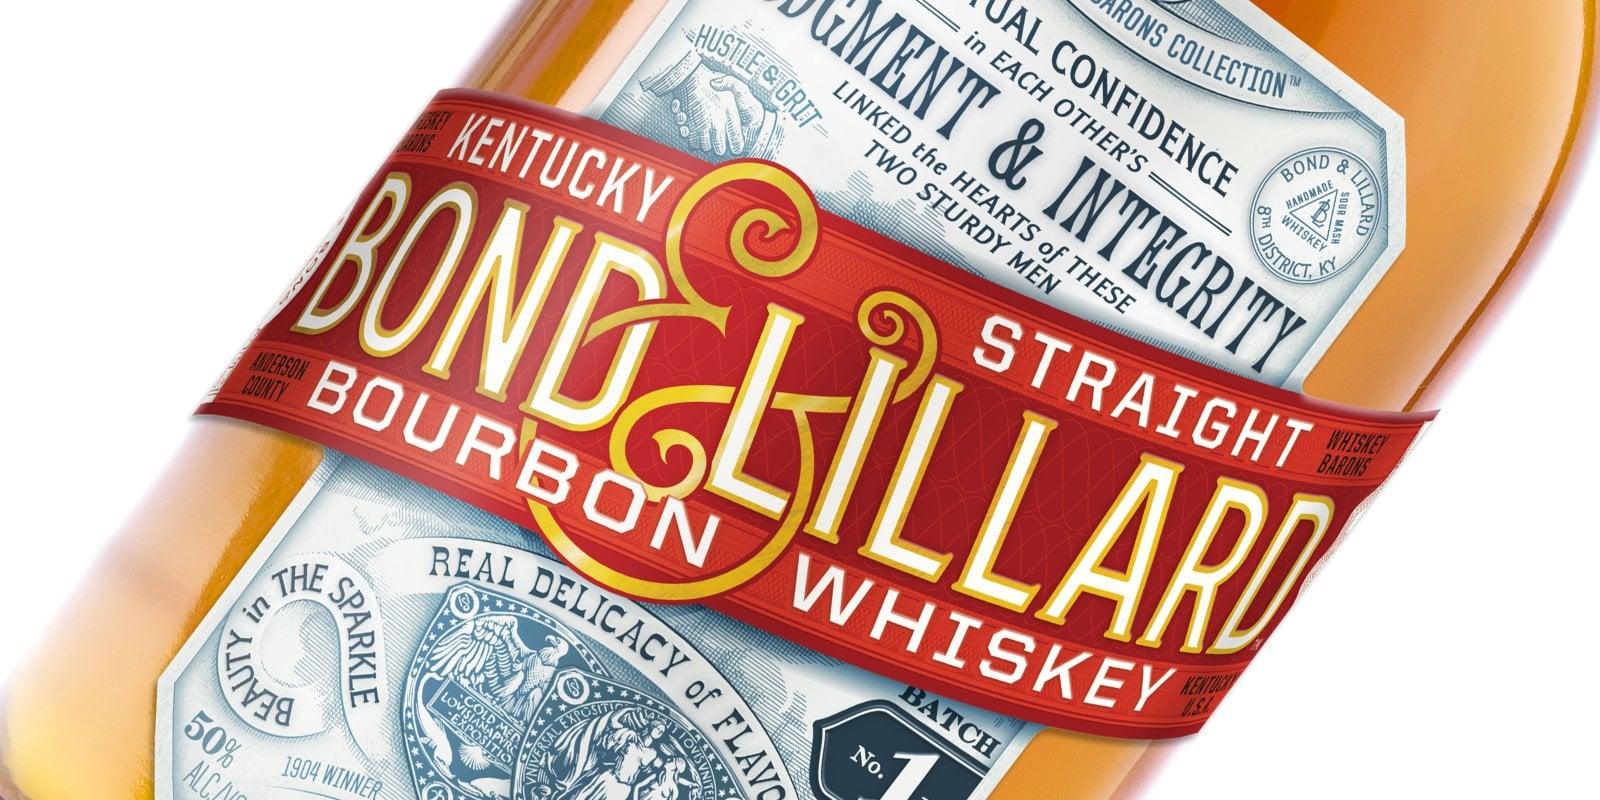 Campari Whiskey Barons Bond & Lillard-Banner Image